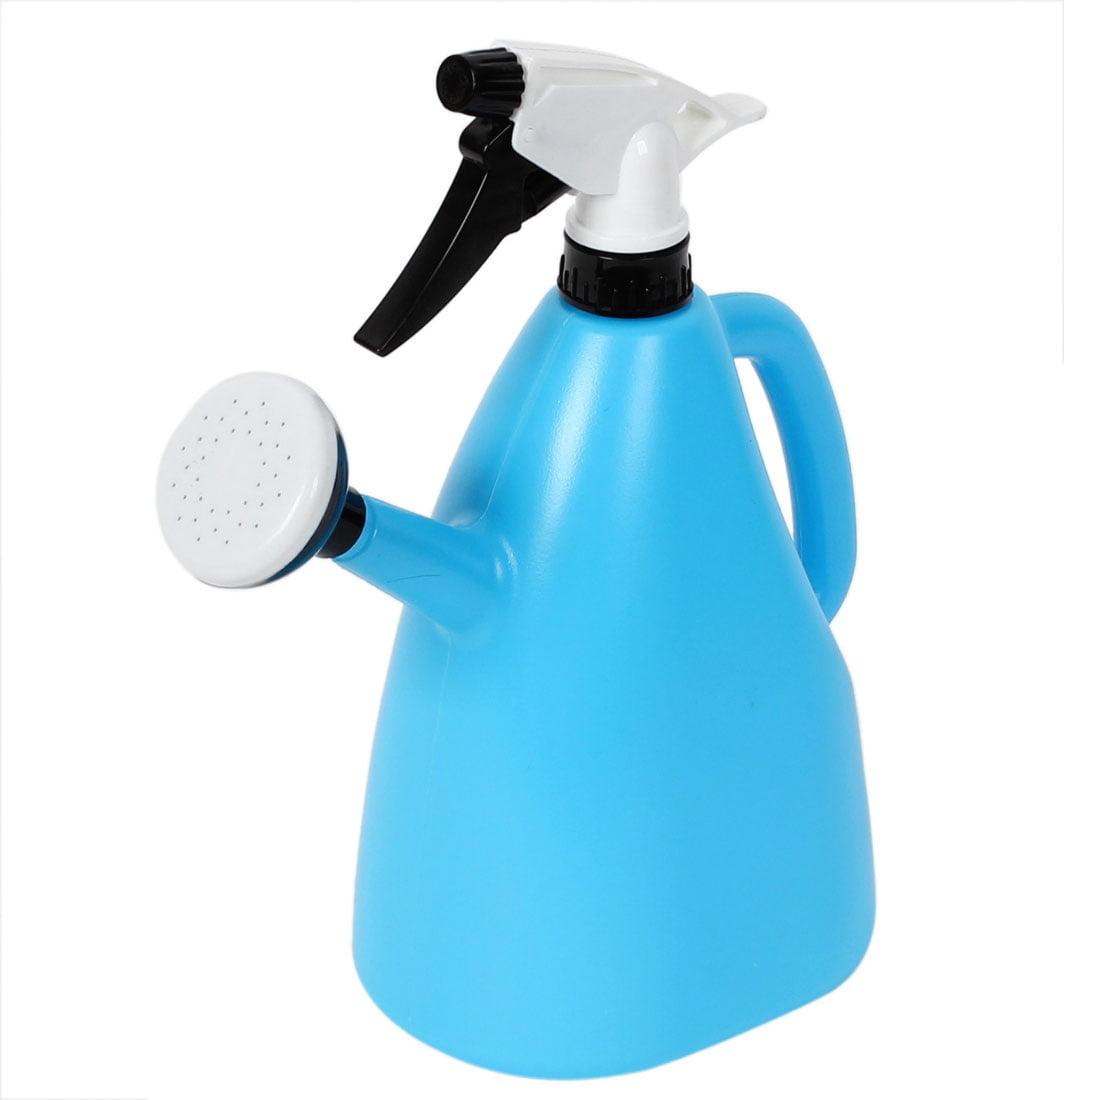 Unique Bargains Garden Plastic Dual Nozzles Water Flower Trigger Spray Bottle Sprayer Sky Blue